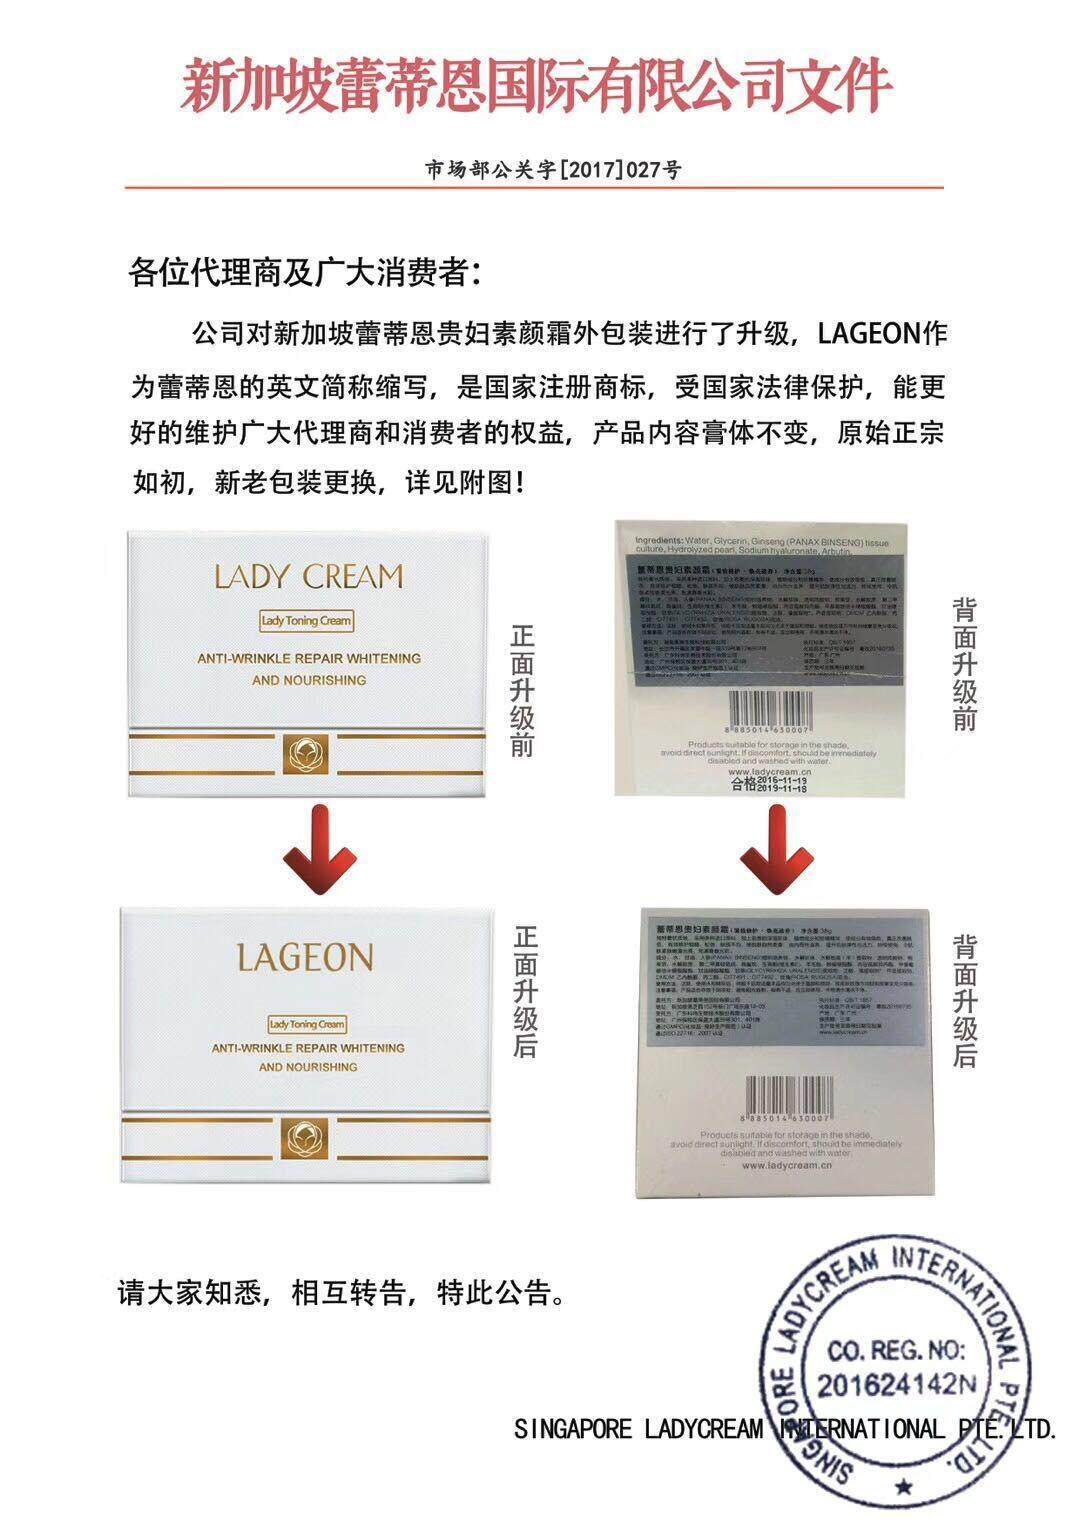 () ()38 (Lageon Box) Singapore Lageon Ladies Placenta Cream (Yellow) 38g